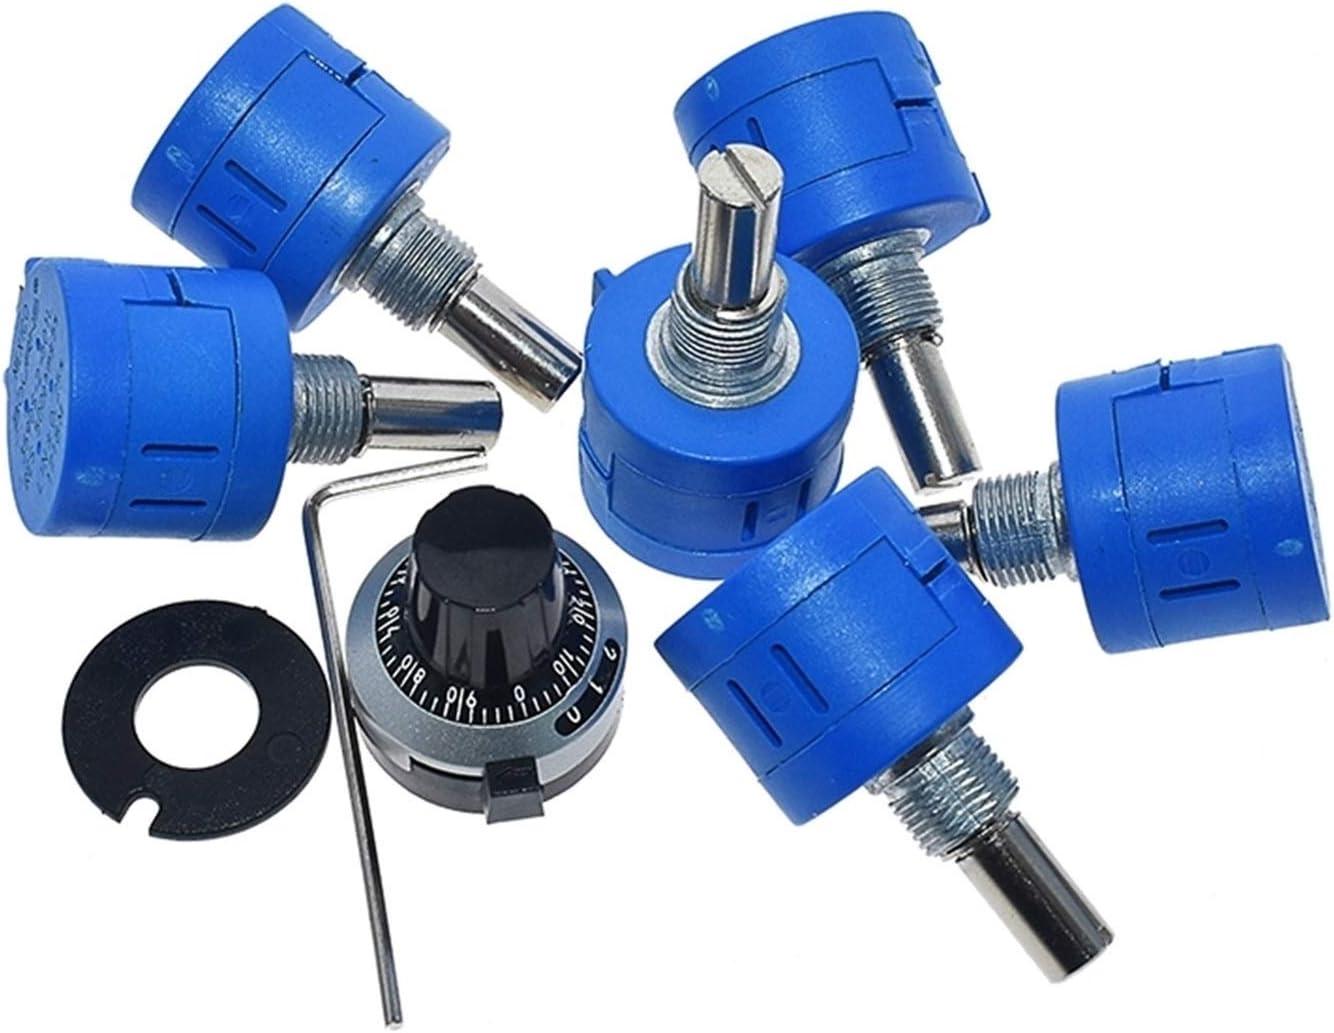 ZHENGLUSM Resistor 3590S Sale item Nippon regular agency Multiturn Potentiometer 500 1K 2K 5K 10